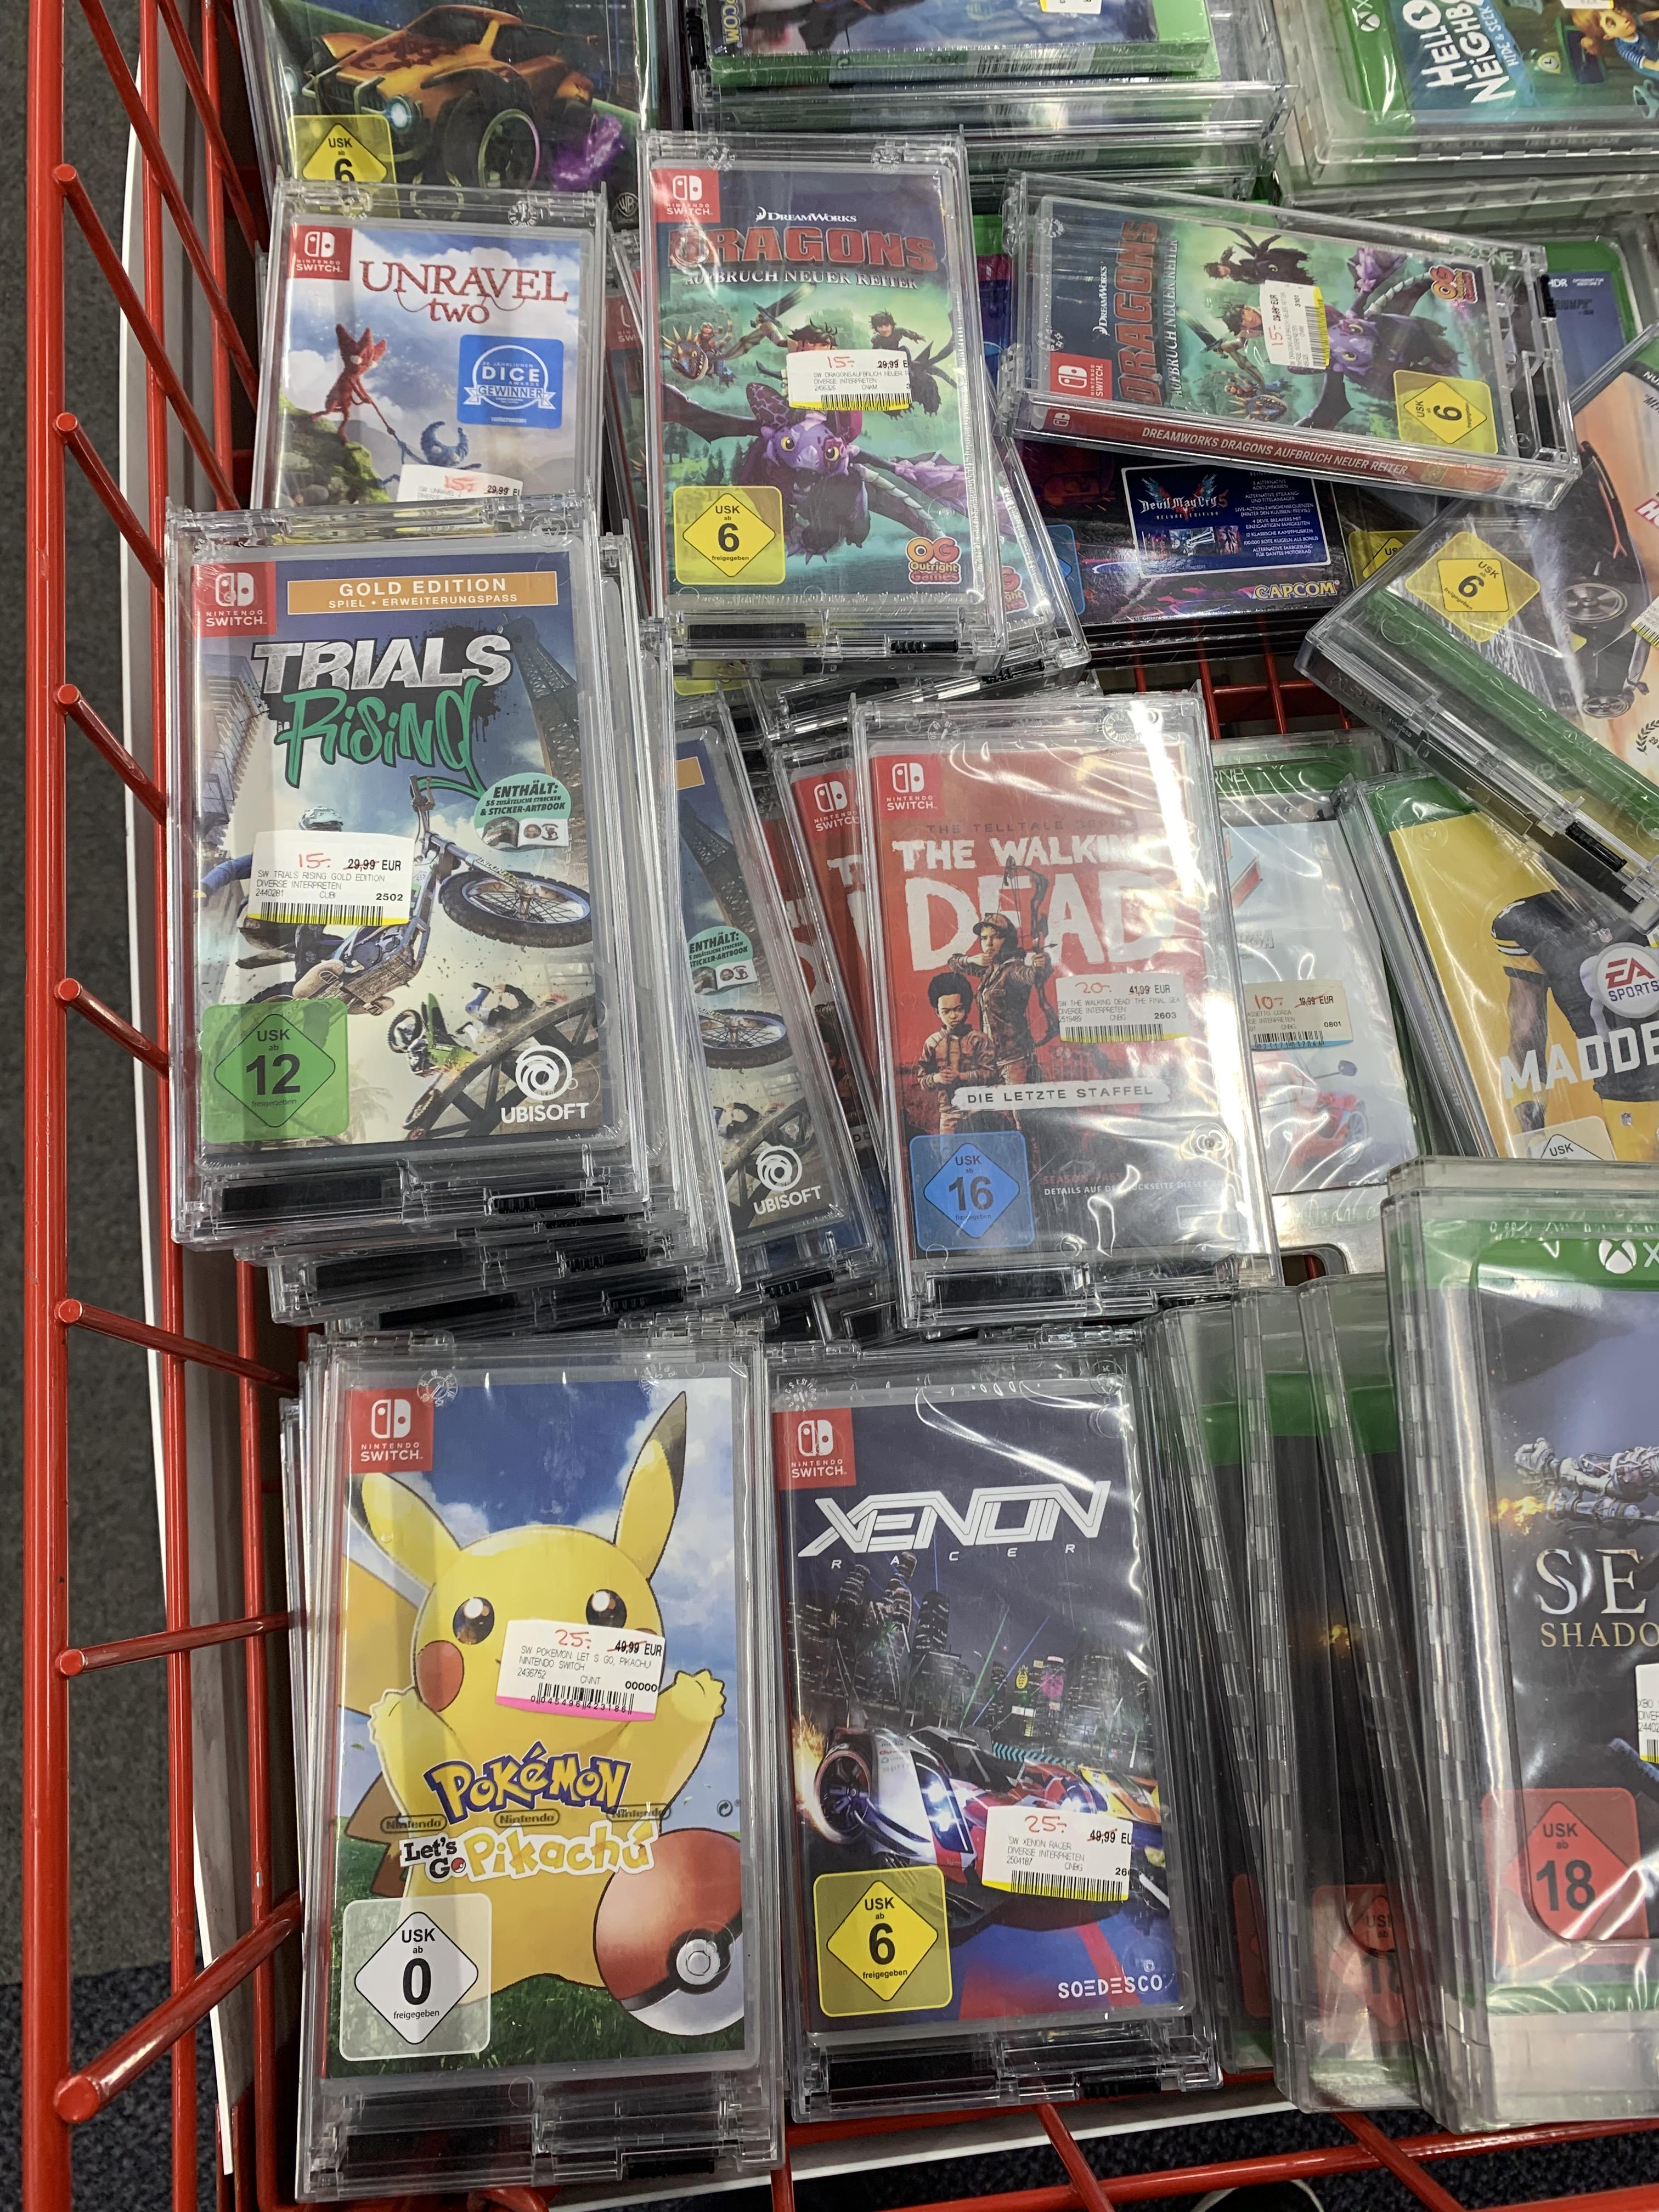 [Lokal Stuttgart] Mediamarkt Switch Games- Pokemon Lets Go Pikachu, Unravel Two, Drachen zähmen...